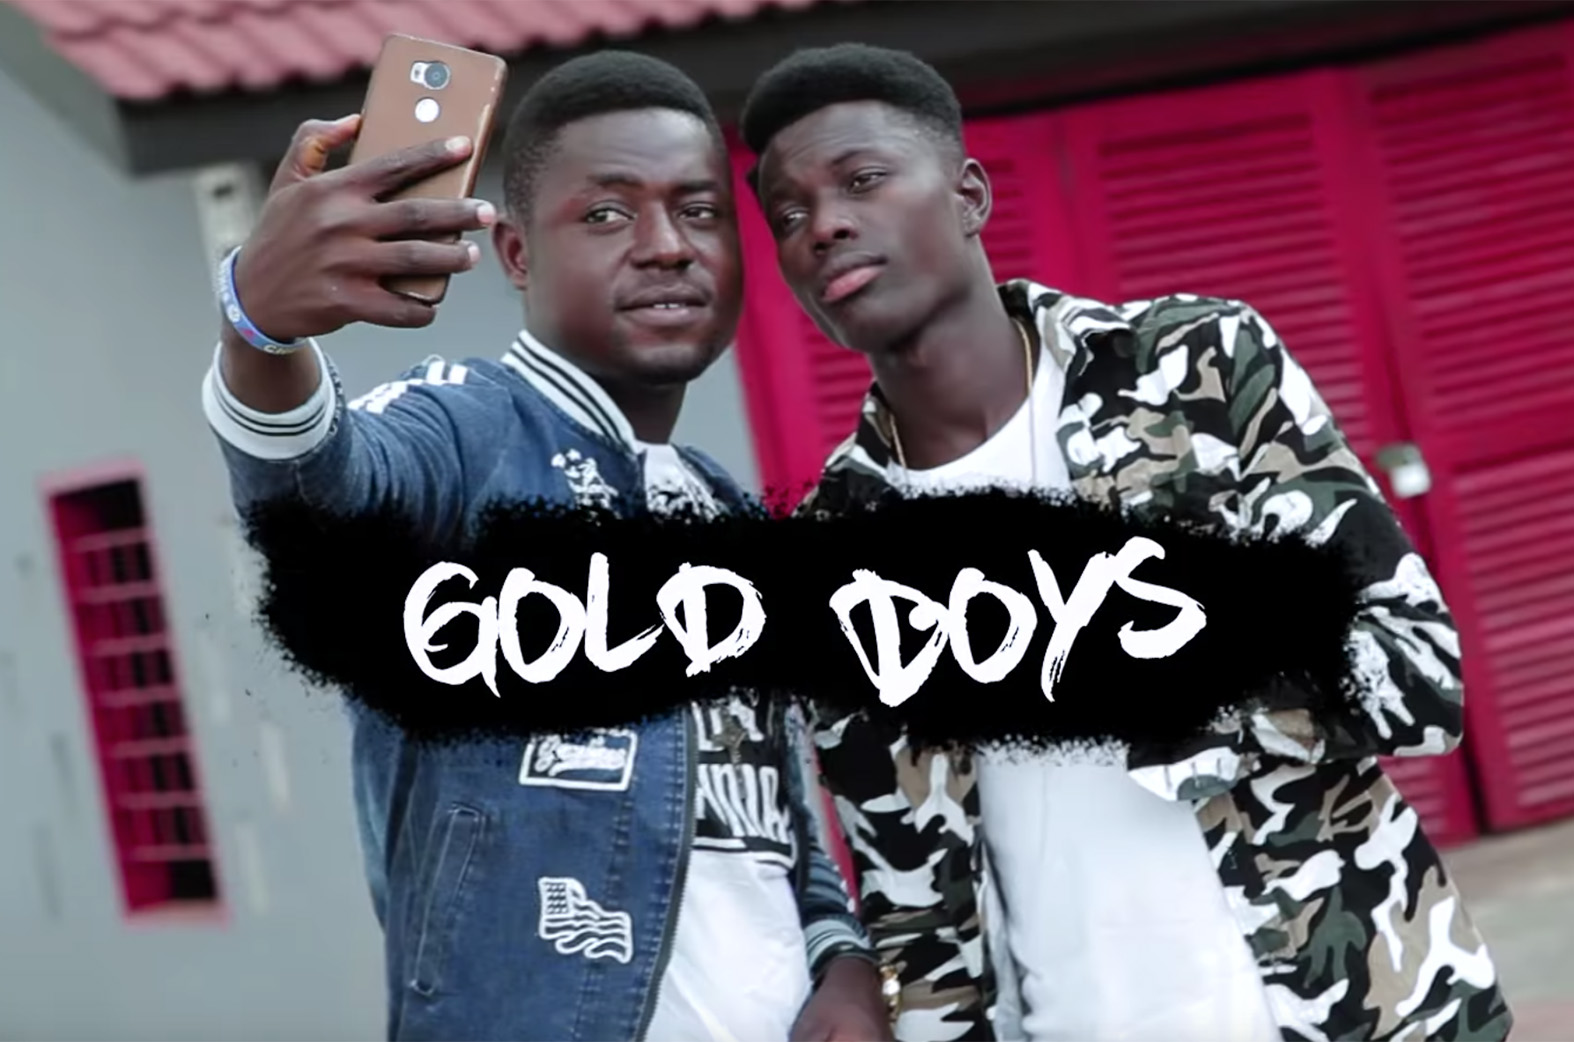 Mafe Wo by Gold Boys